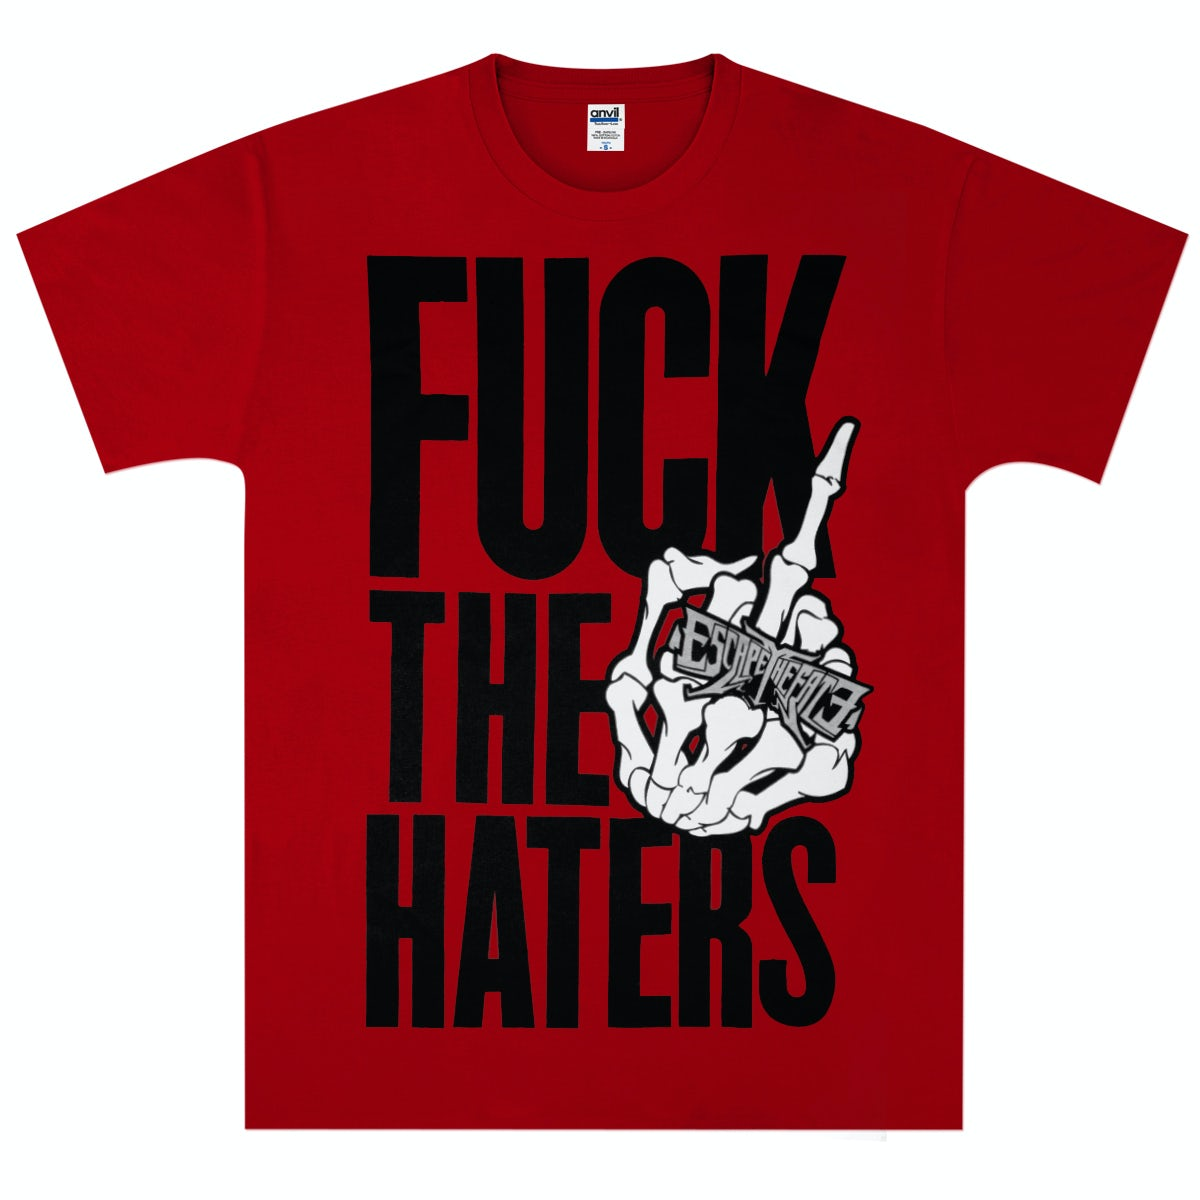 Escape the fate-shirt small punk new